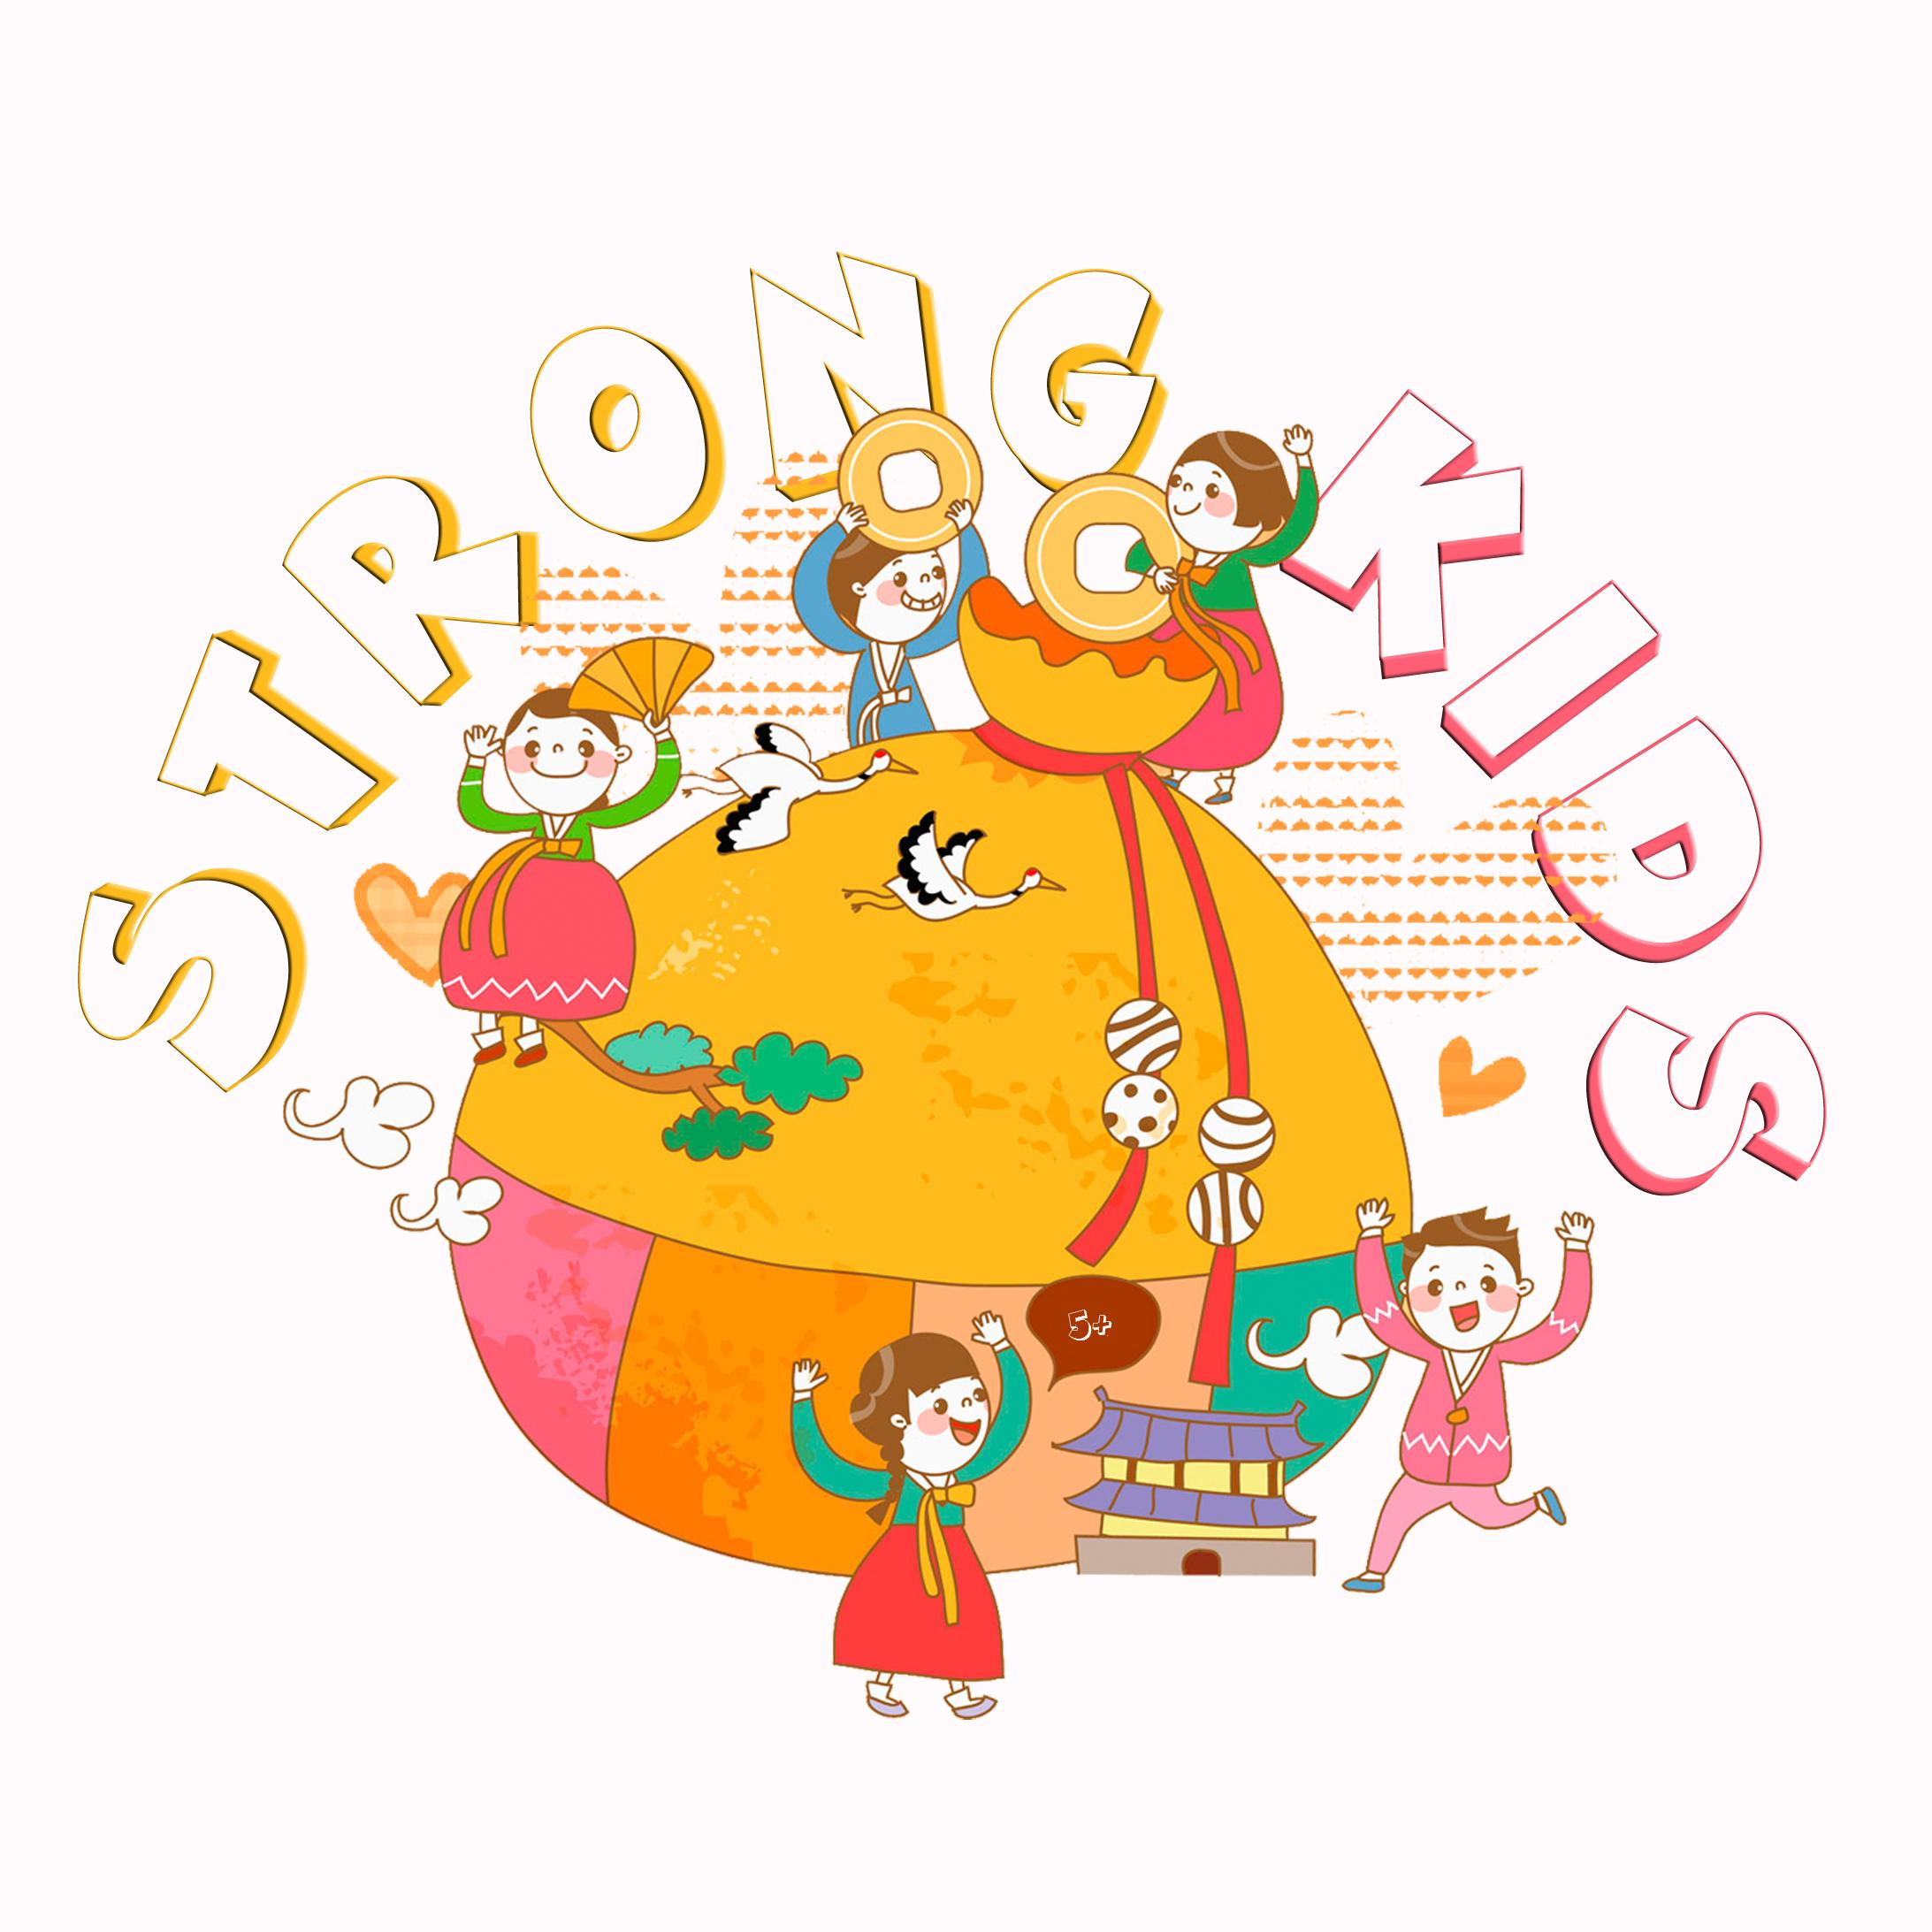 Логотип для Детского Интернет Магазина StrongKids фото f_0575c7e761f417c9.jpg